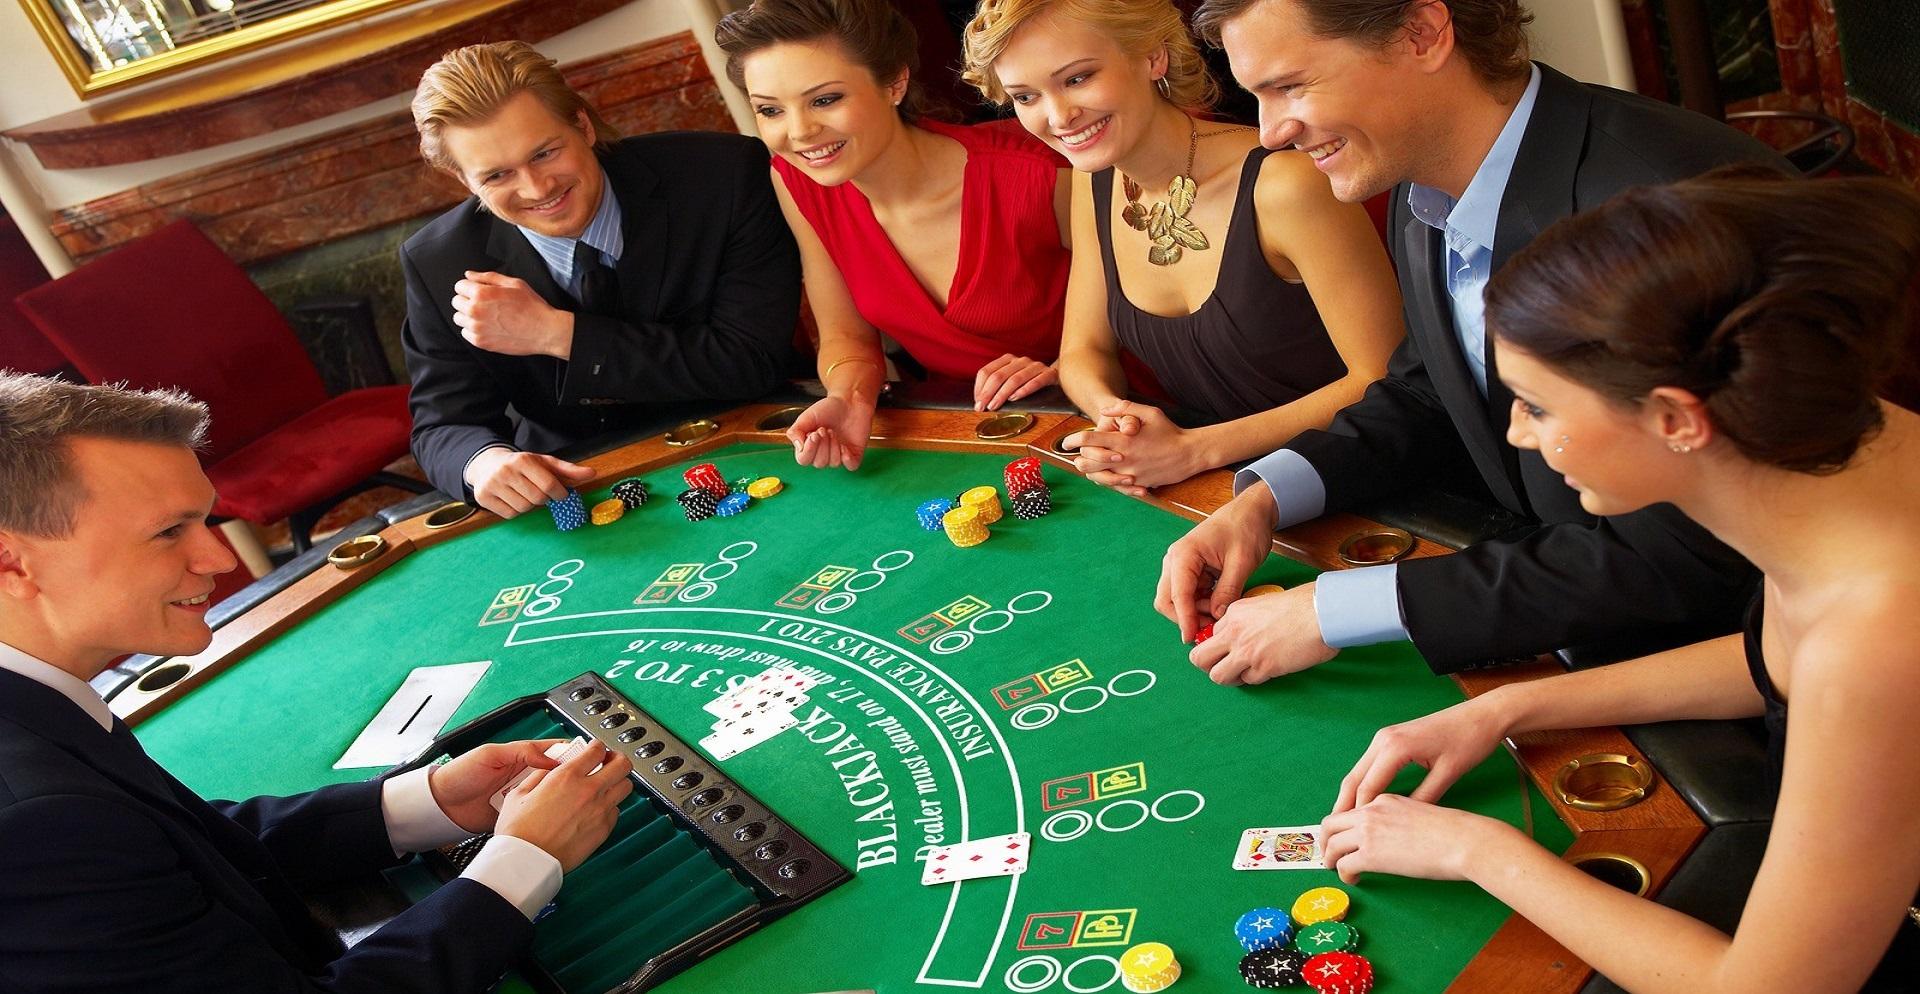 Банкомет казино казино онлайн с большими ставками